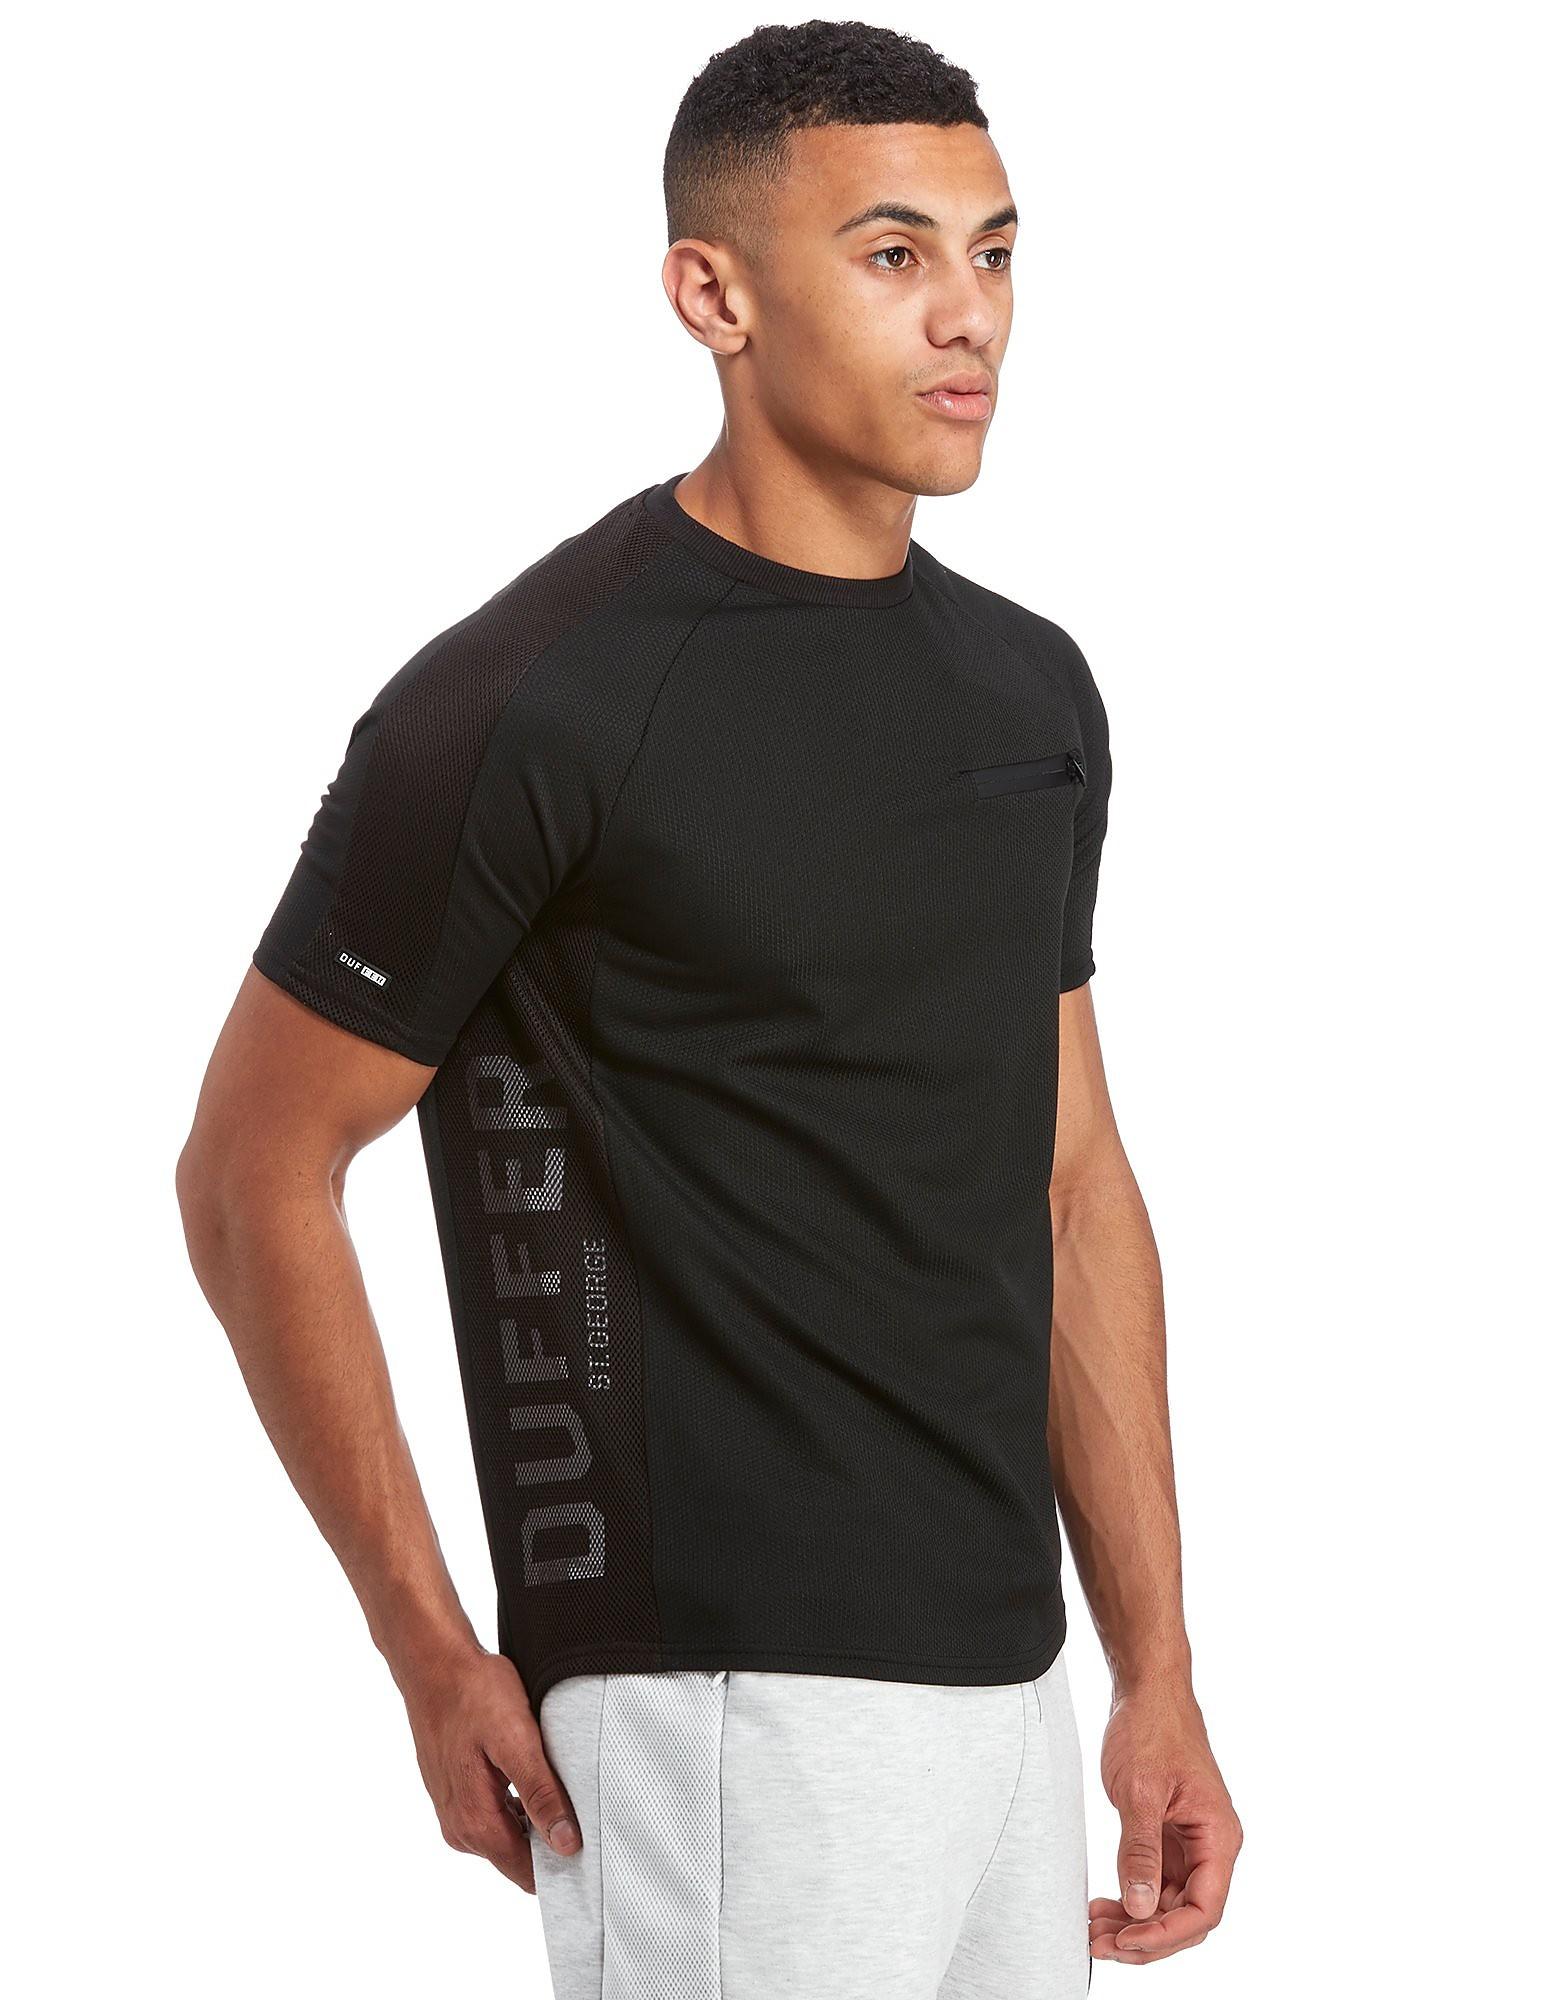 Duffer of St George Rowe T-Shirt